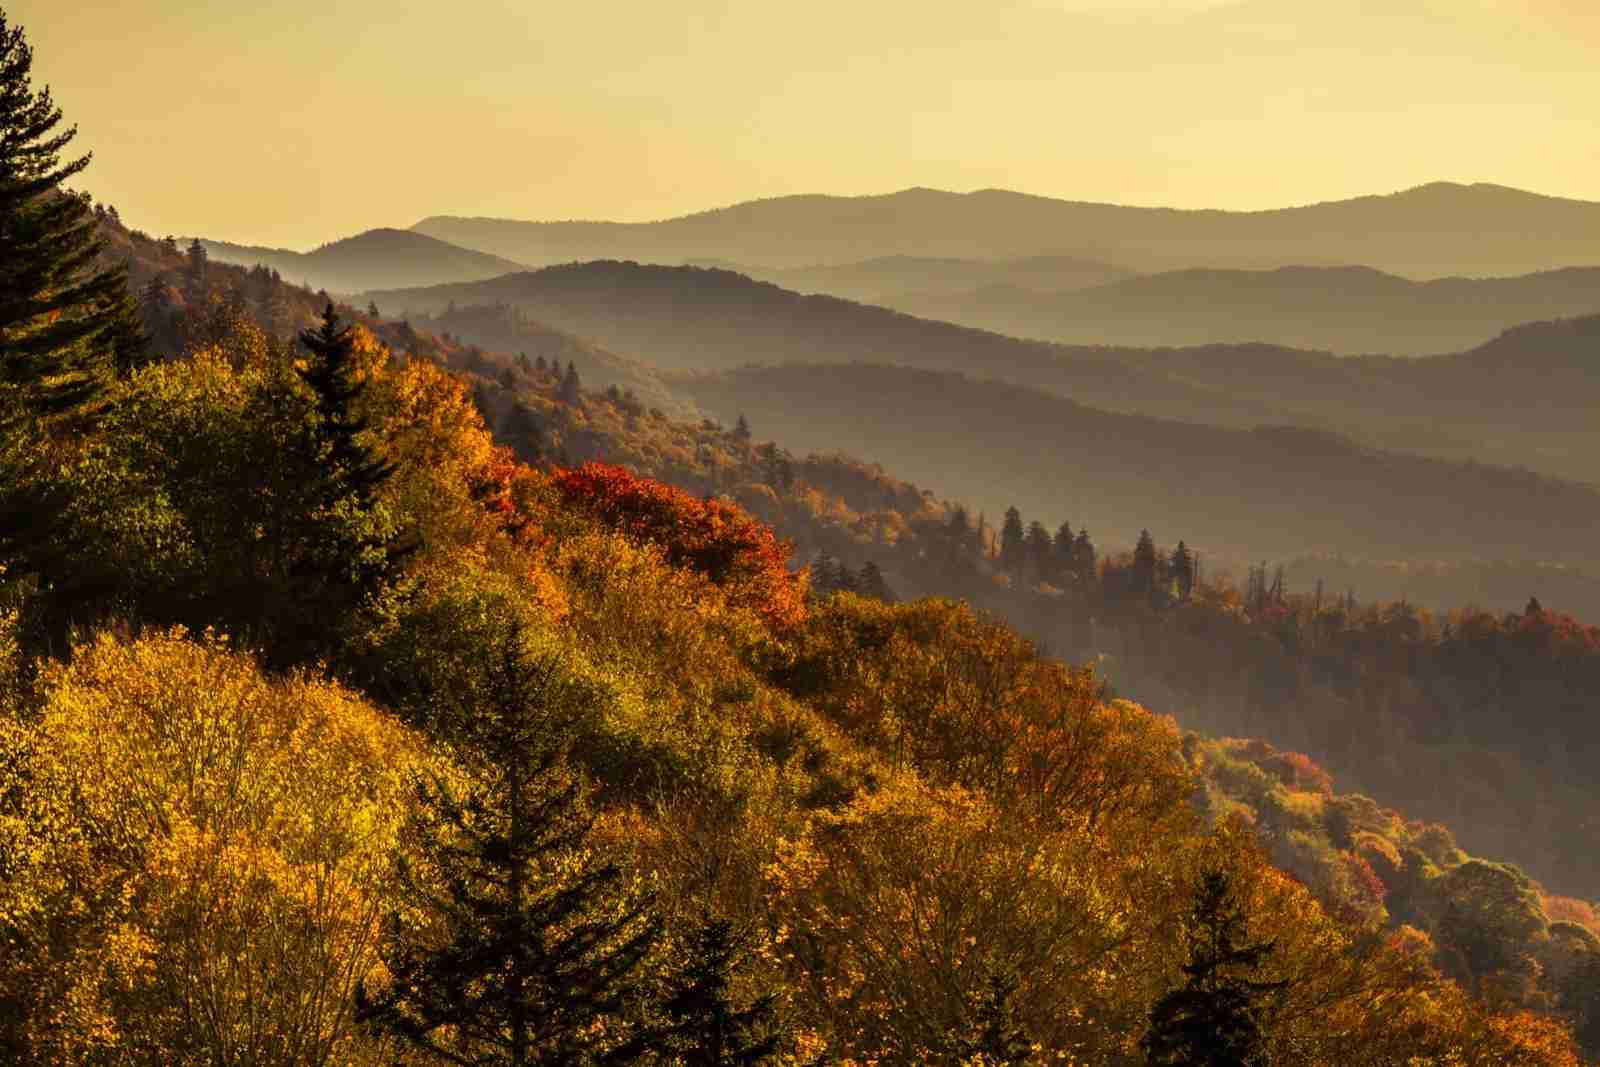 Great Smoky Mountains National Park. (Photo by Teri/Adobe Stock)